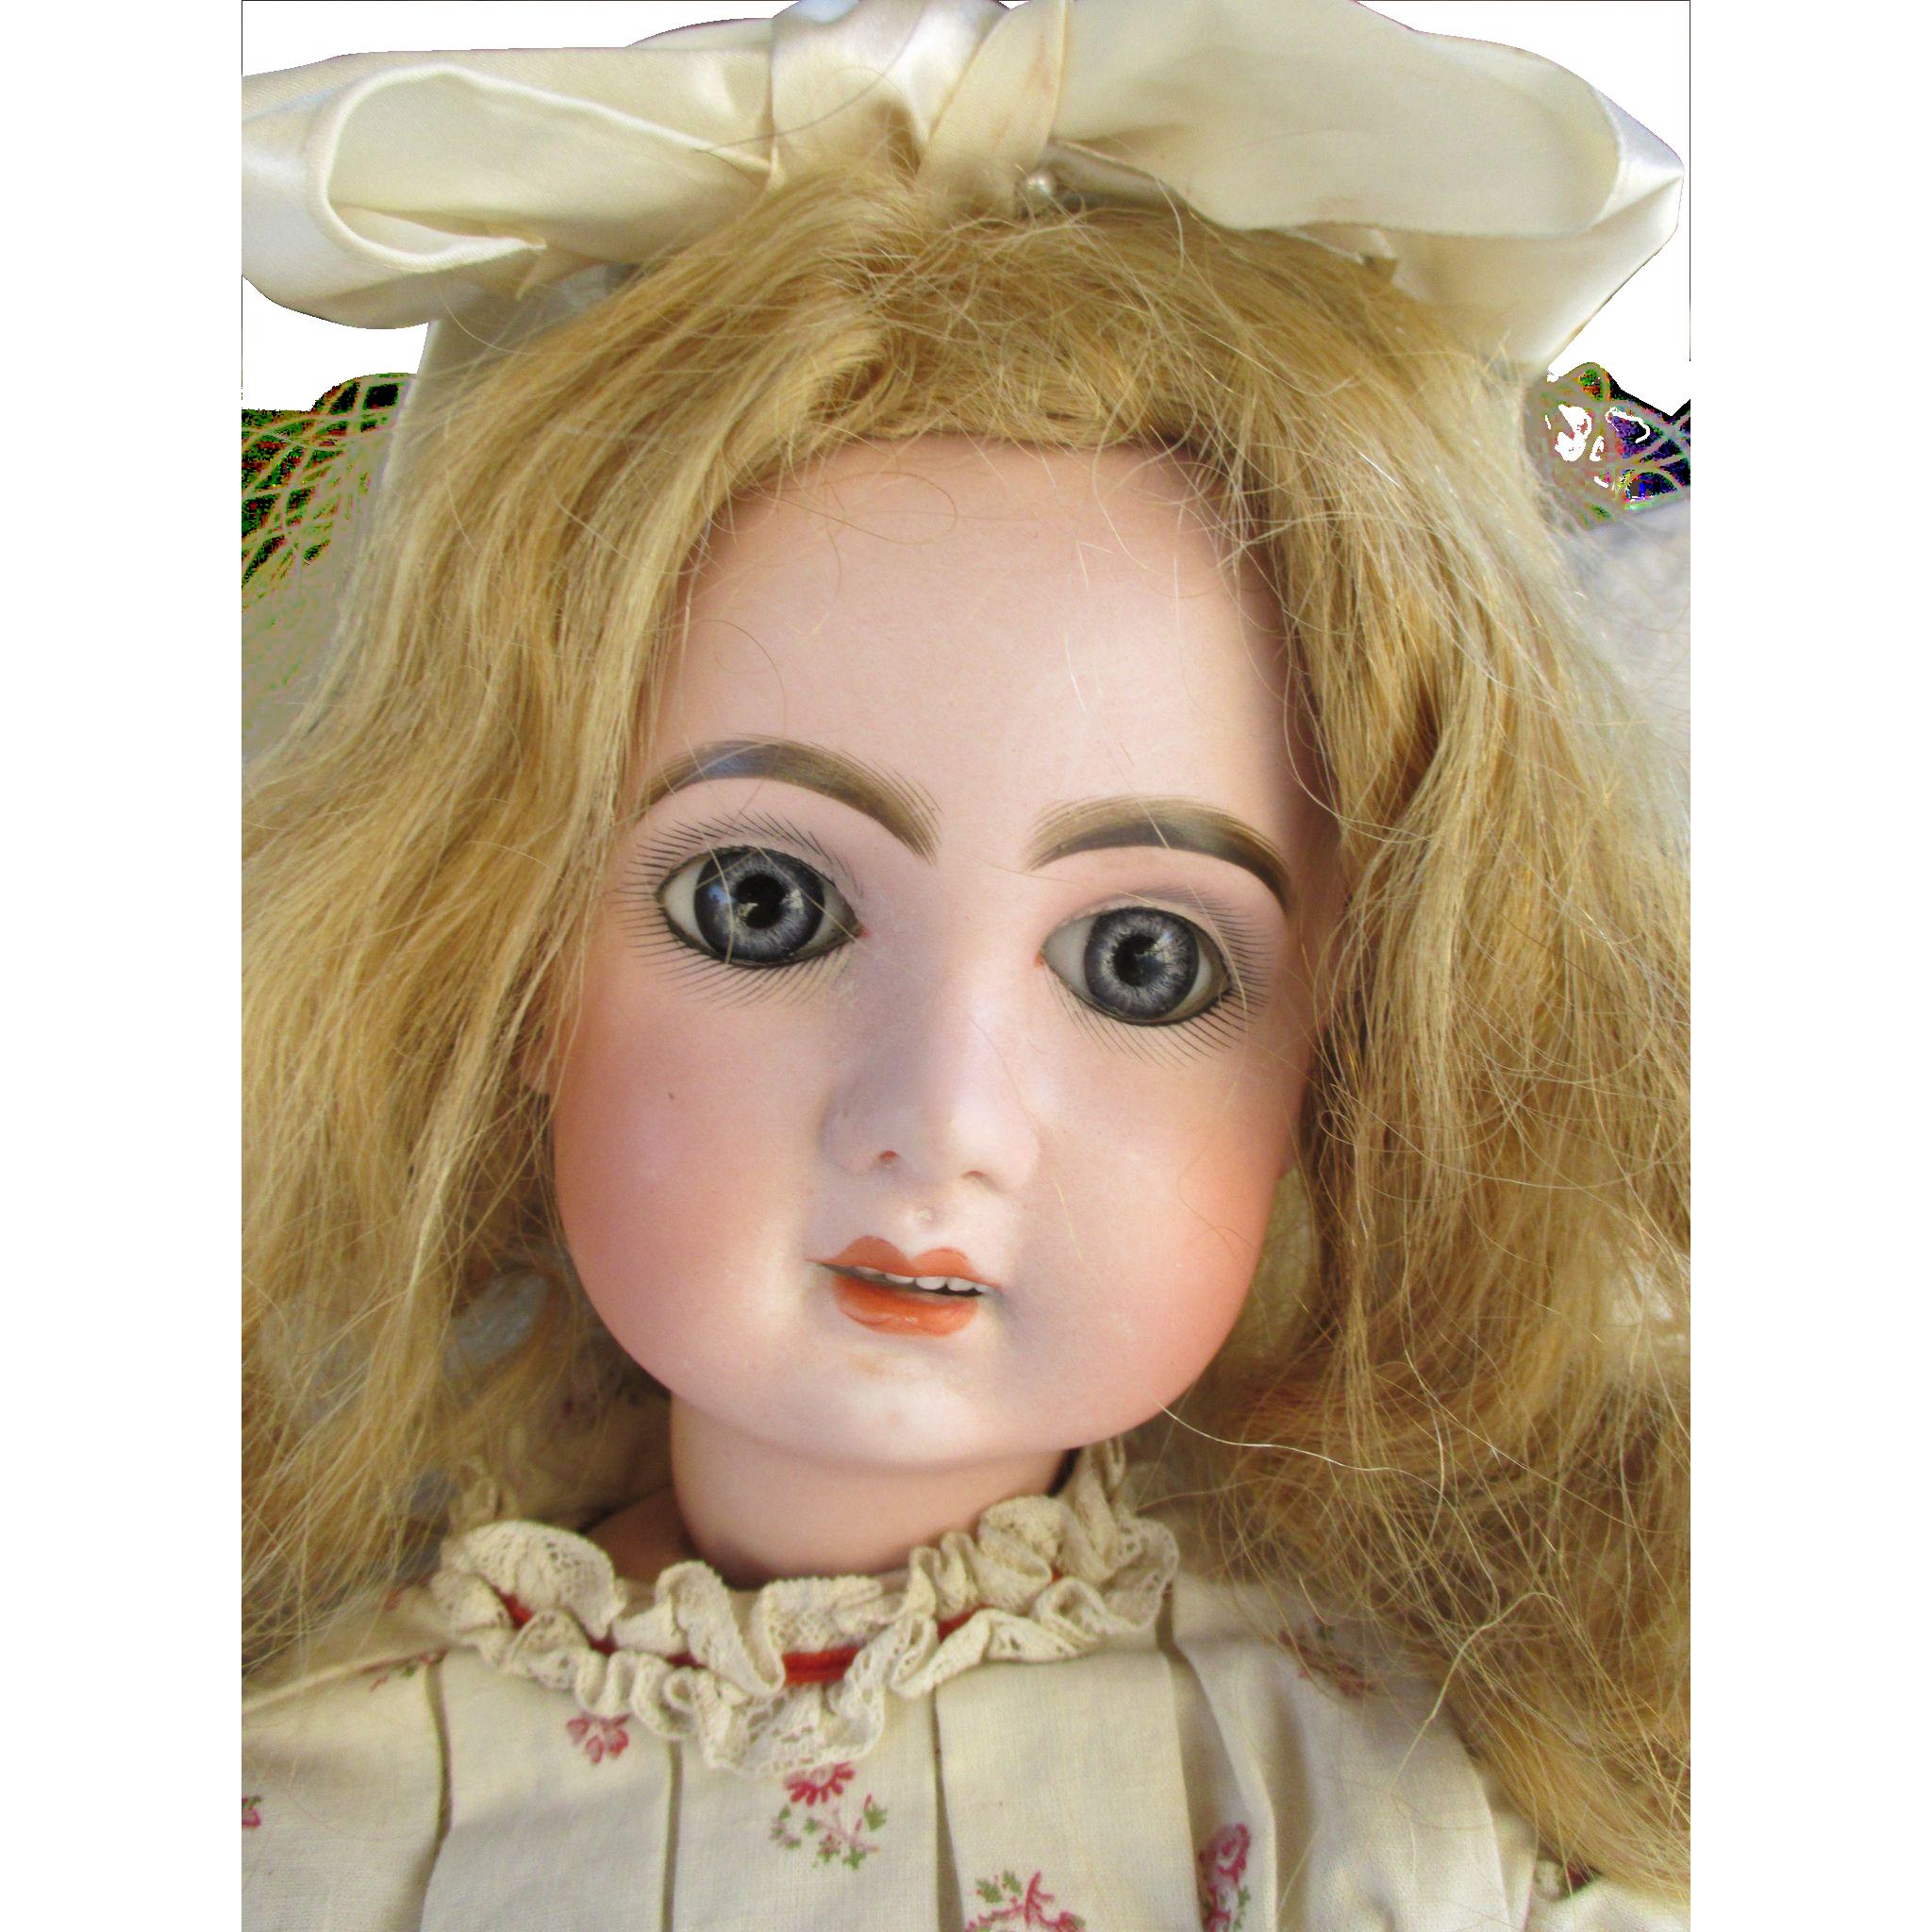 Tete Jumeau - French Doll - Beautiful Antique French Tete Jumeau Doll